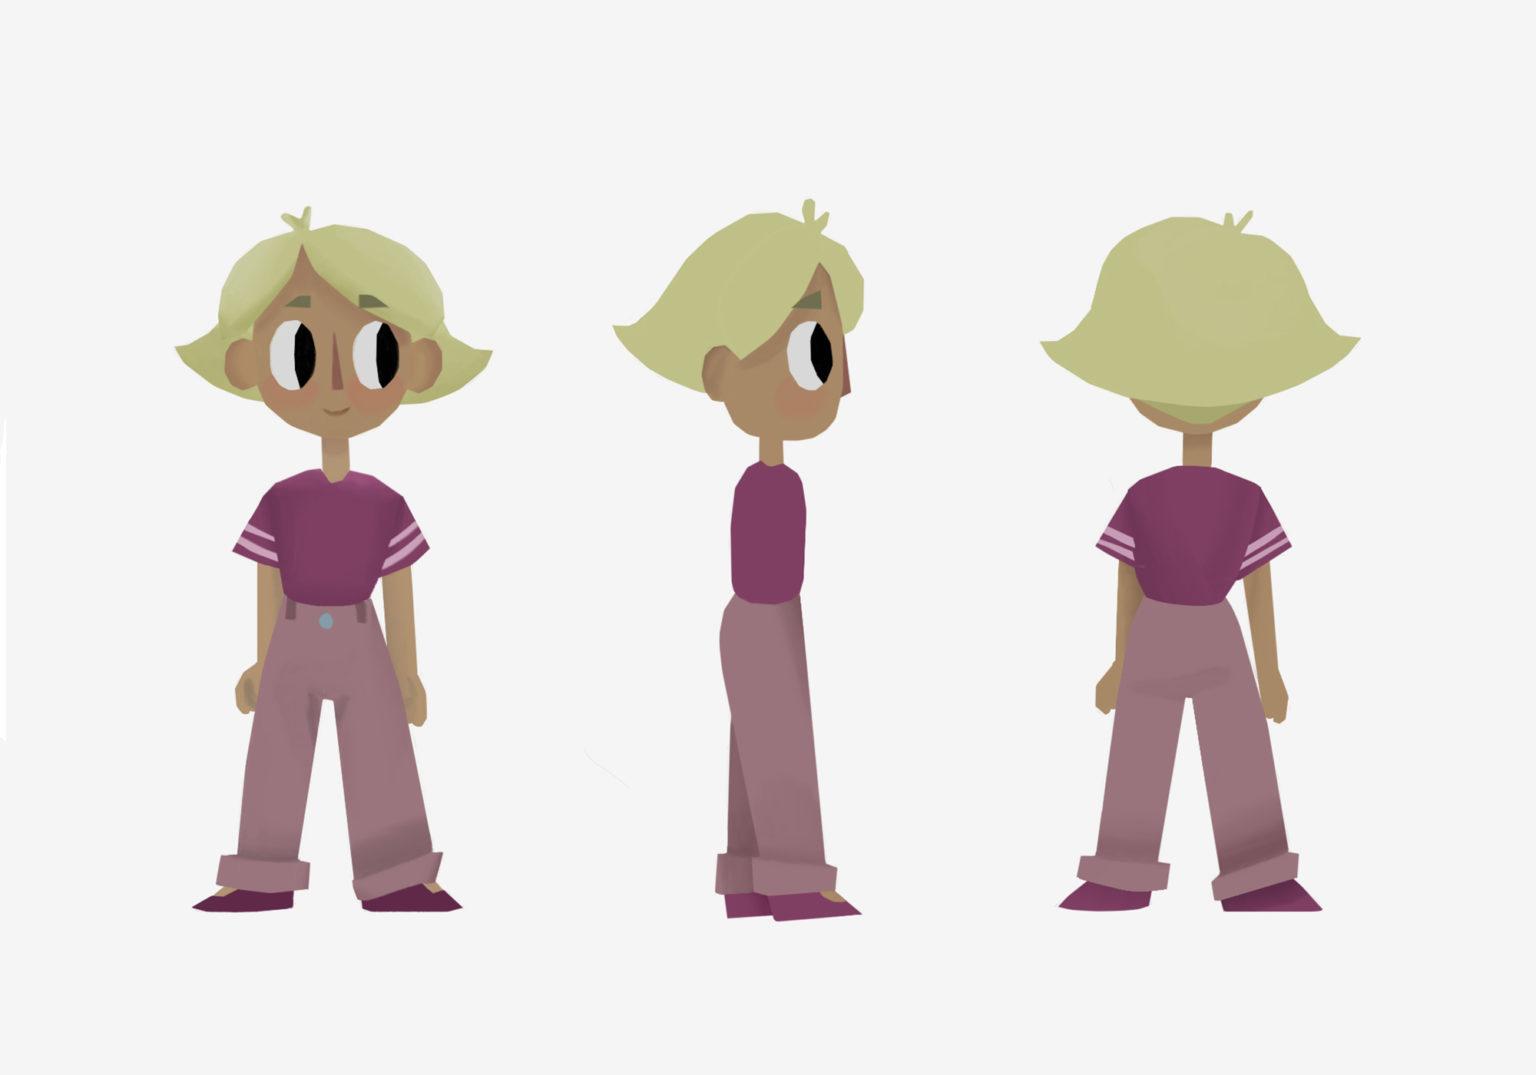 final 2D design of main character